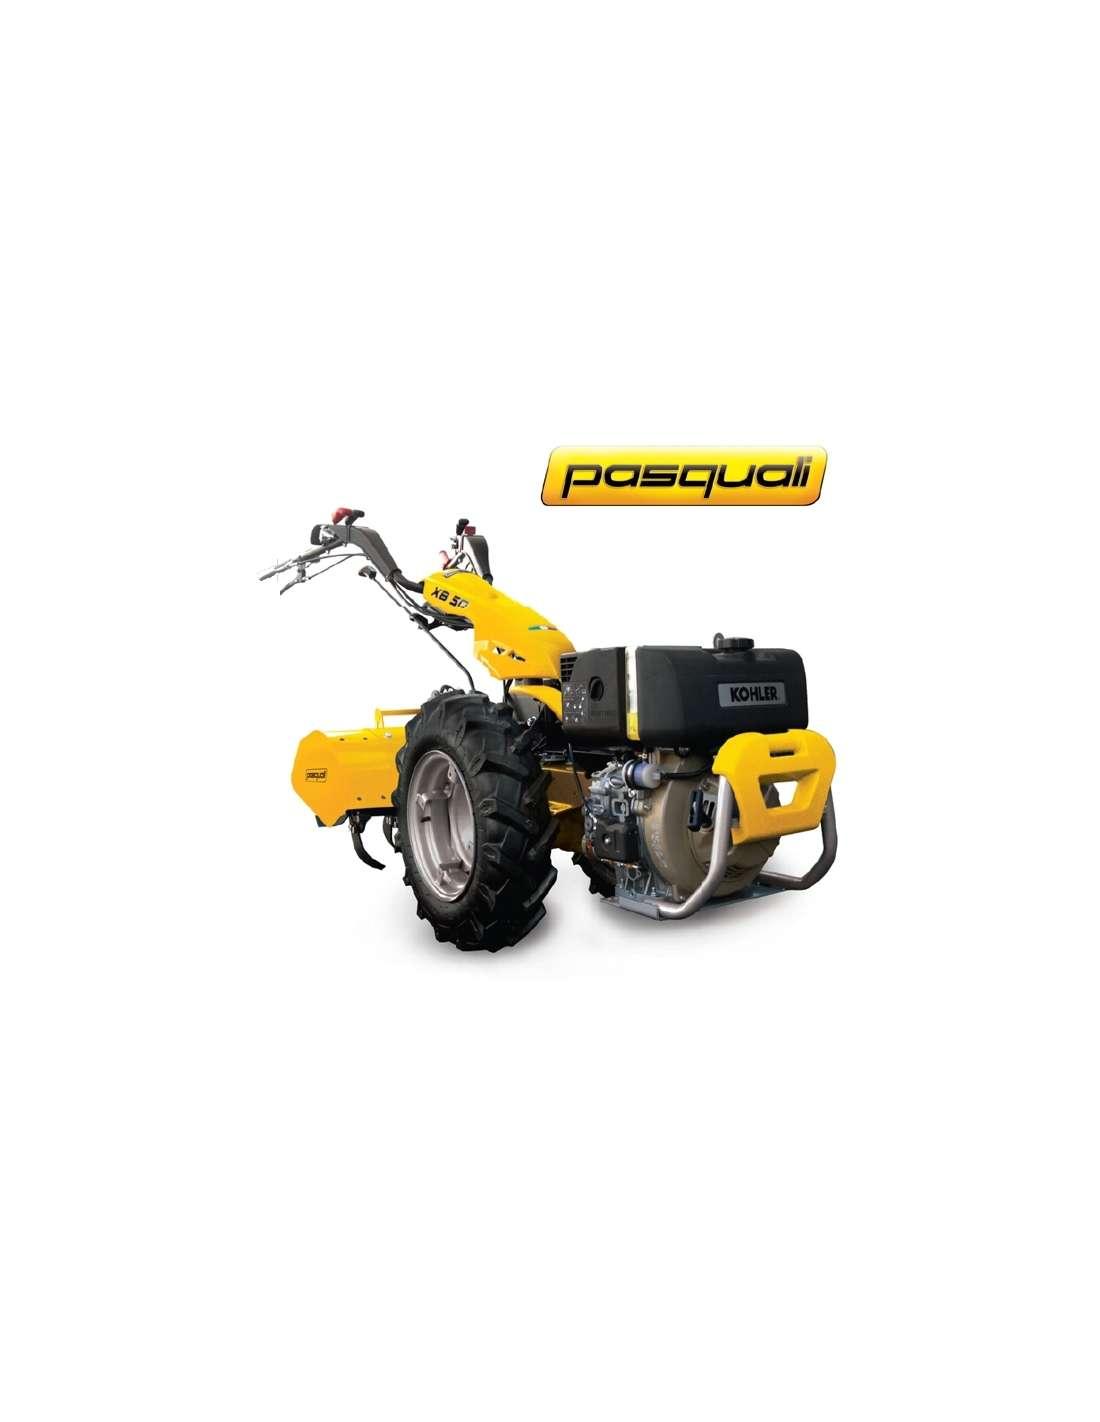 Motocultor pasquali xb50 100 financiaci n 0 inter s - Pasquali espana ...